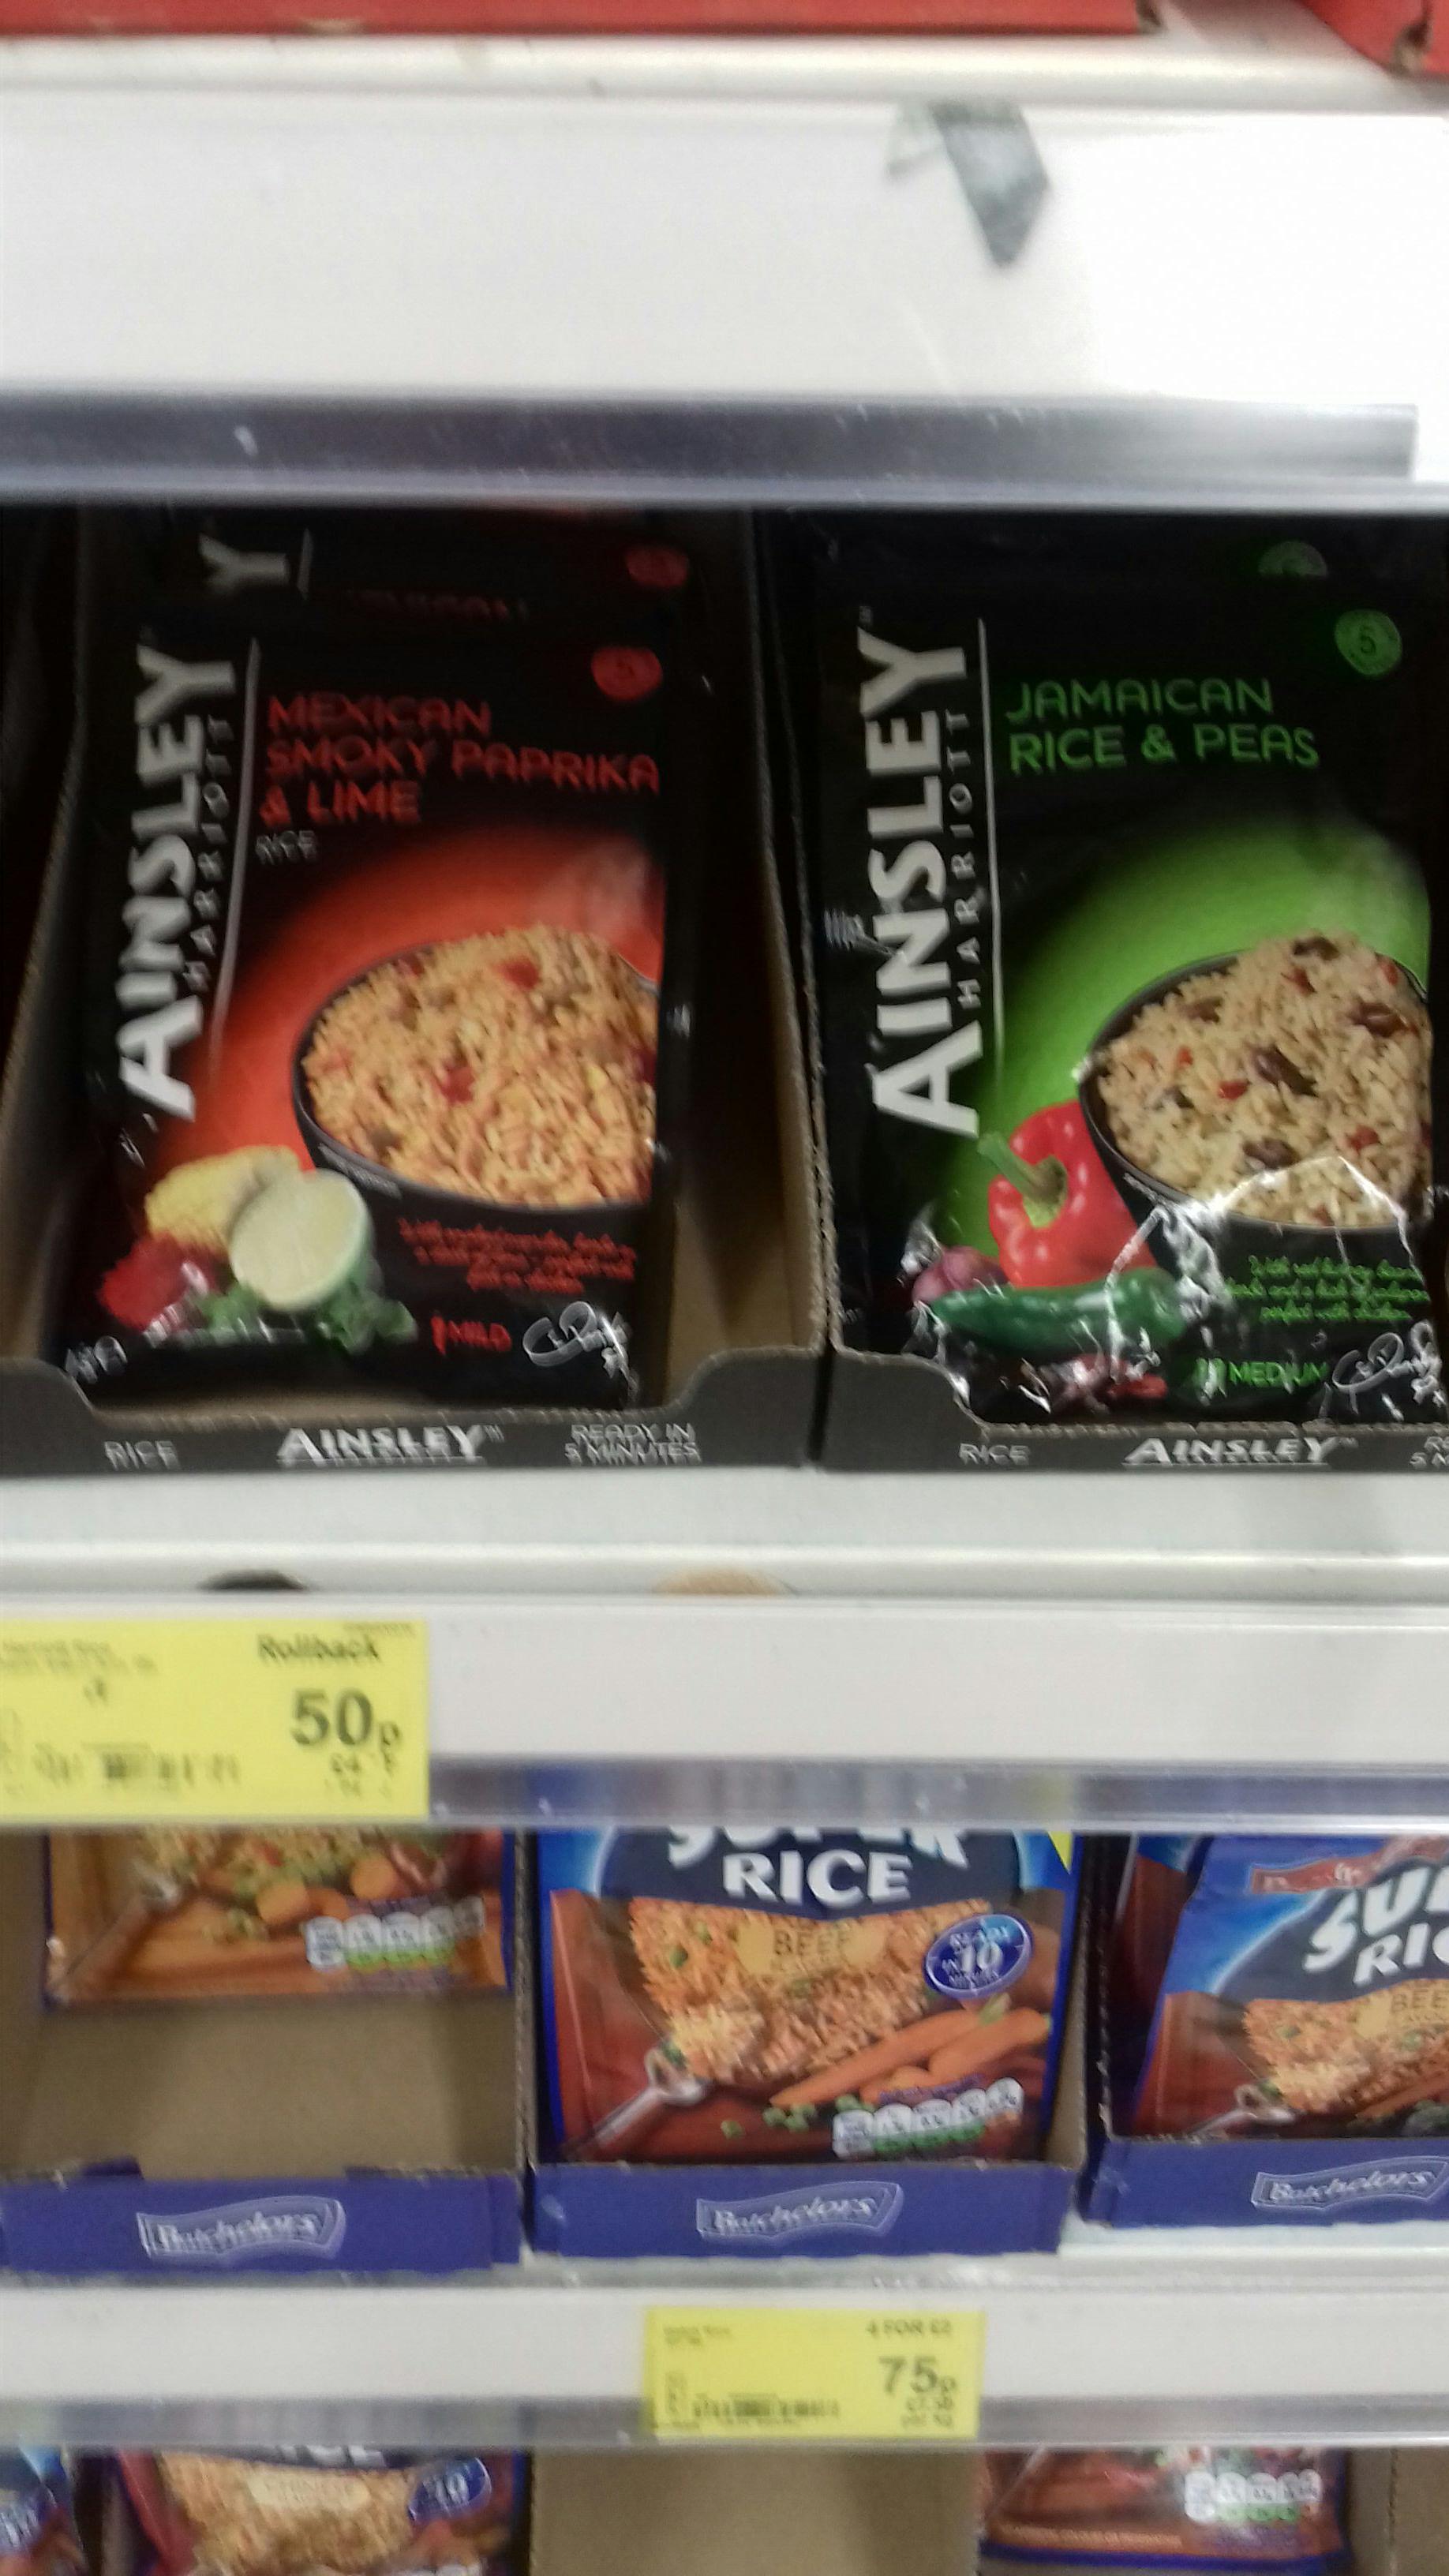 Ainsley harriott rice variety @ asda - national 50p